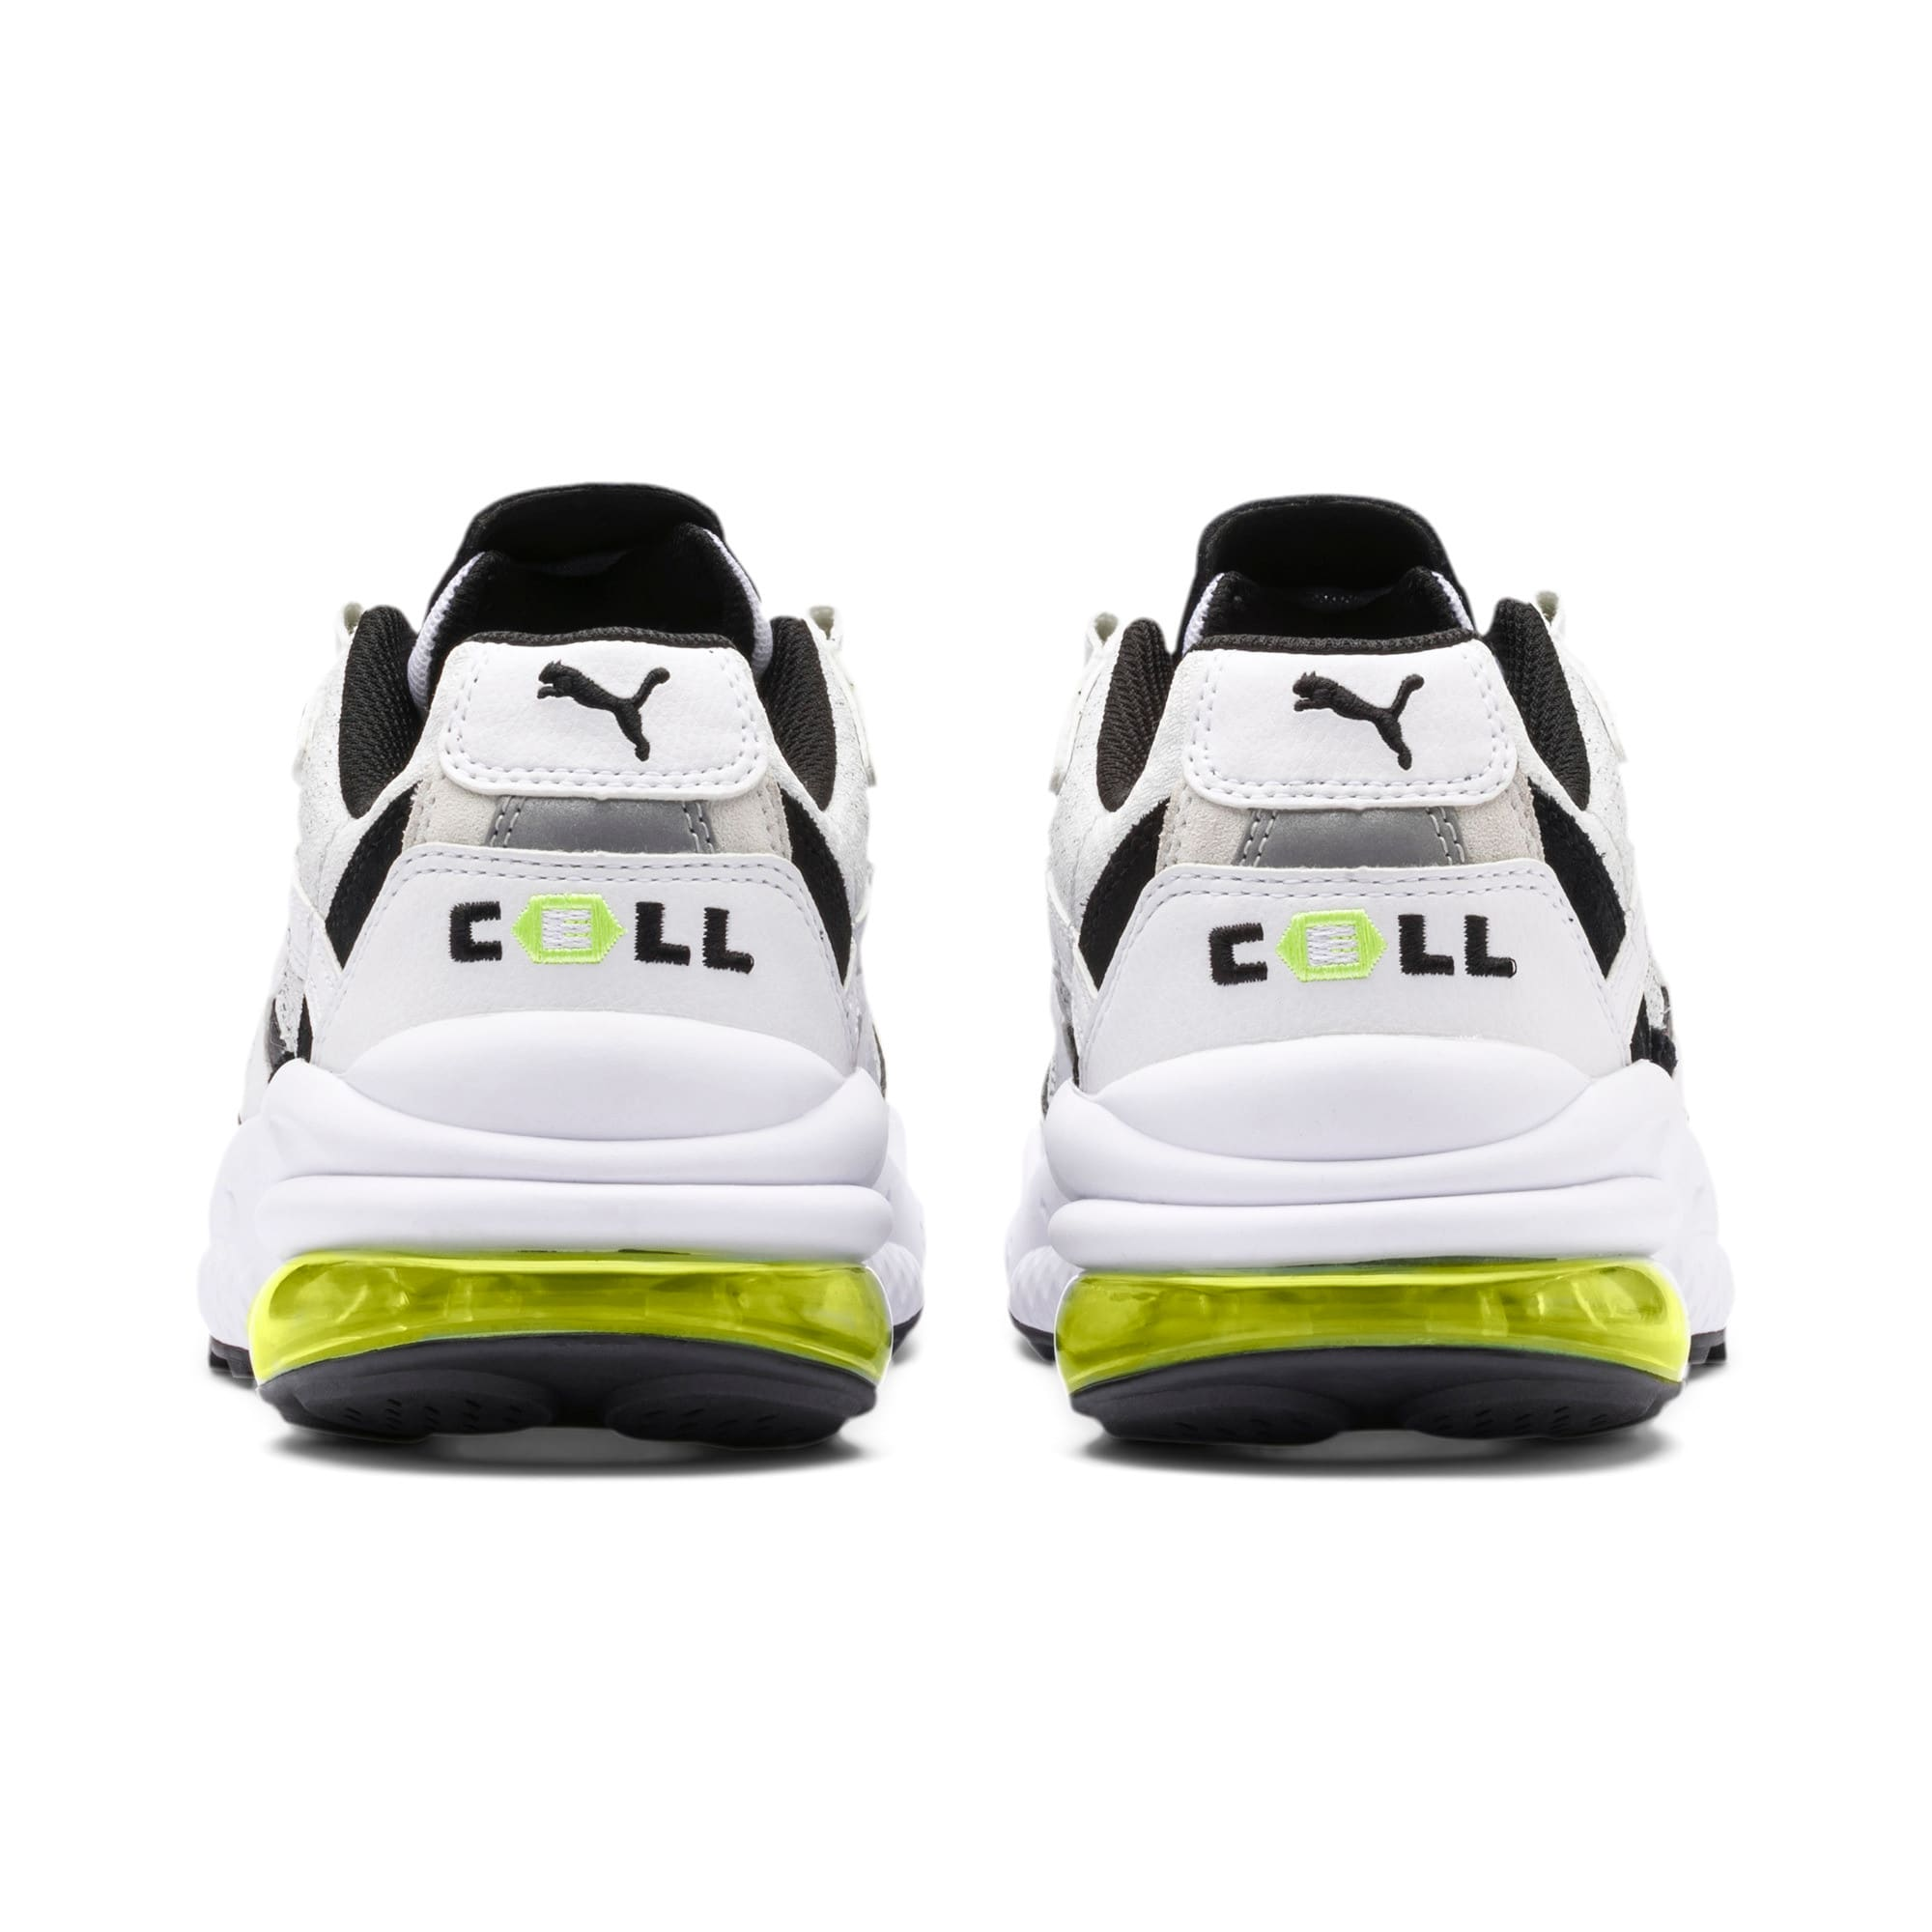 Thumbnail 4 of CELL Venom Alert Sneakers, Puma White-Puma Black, medium